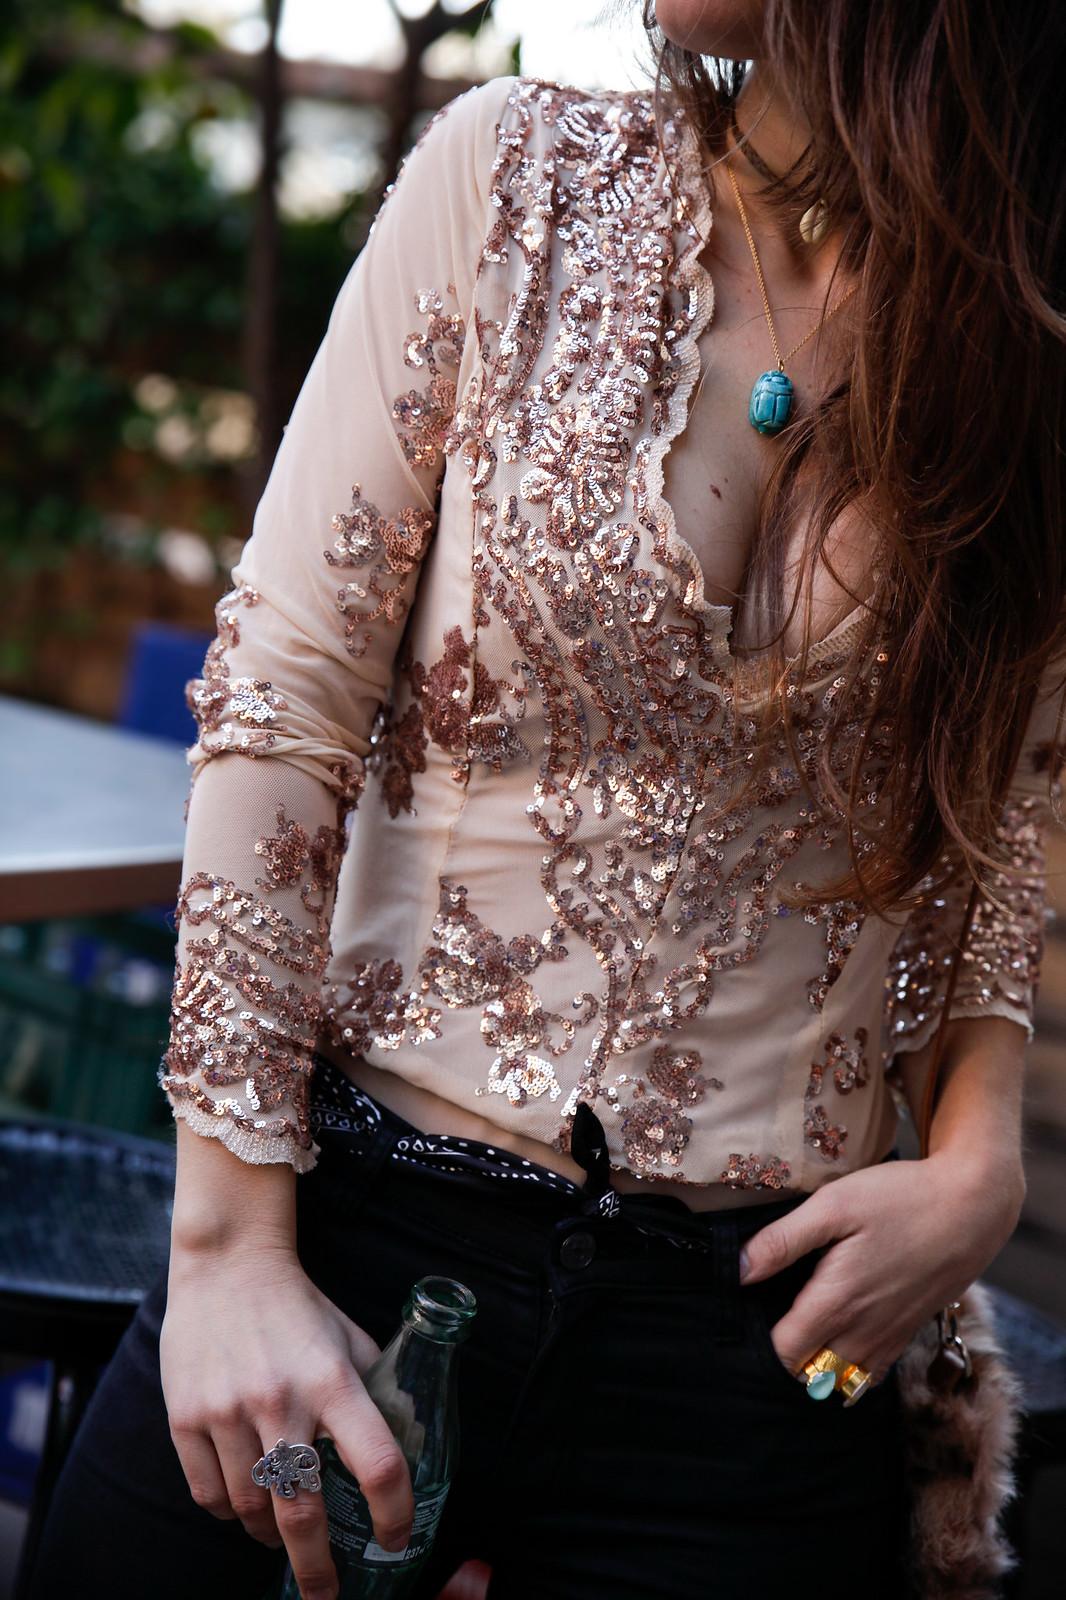 05_Sequins_Body_Nihgt_outfit_Danity_Paris_theguestgirl_laura_santolaria